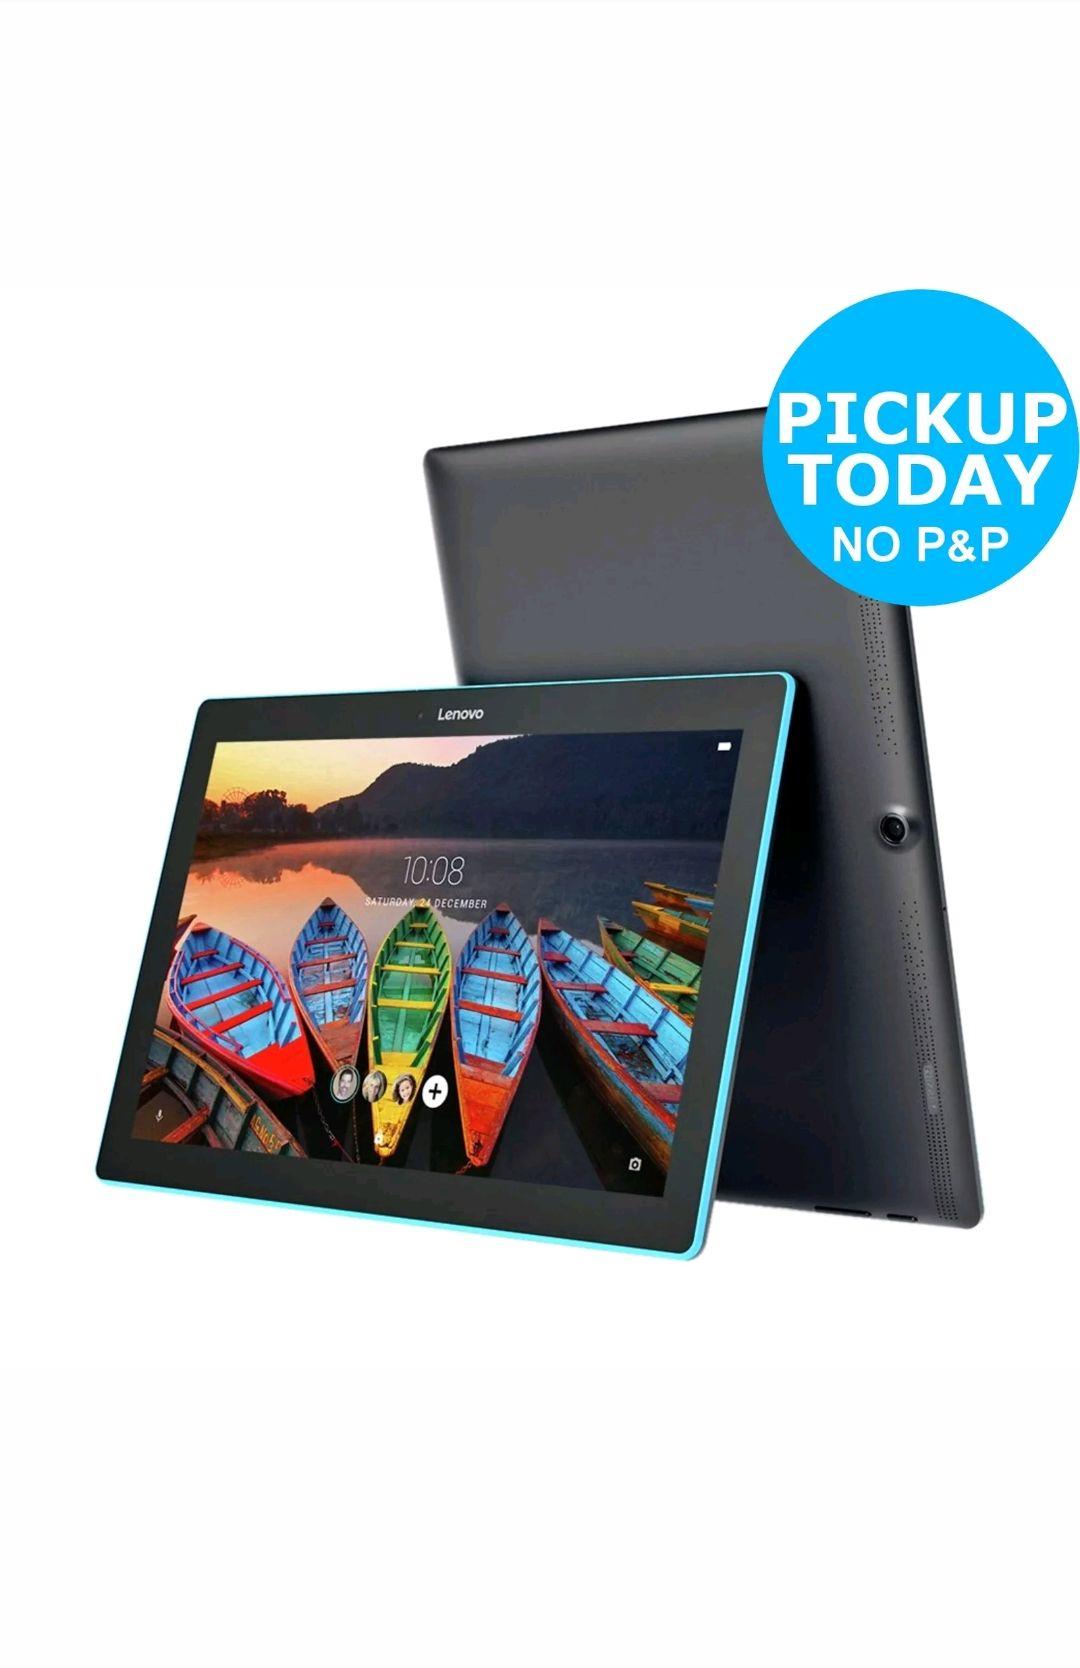 Lenovo Tab 3 10.1 Inch 16GB Android WiFi Tablet - Black £99.99 @ Argos ebay